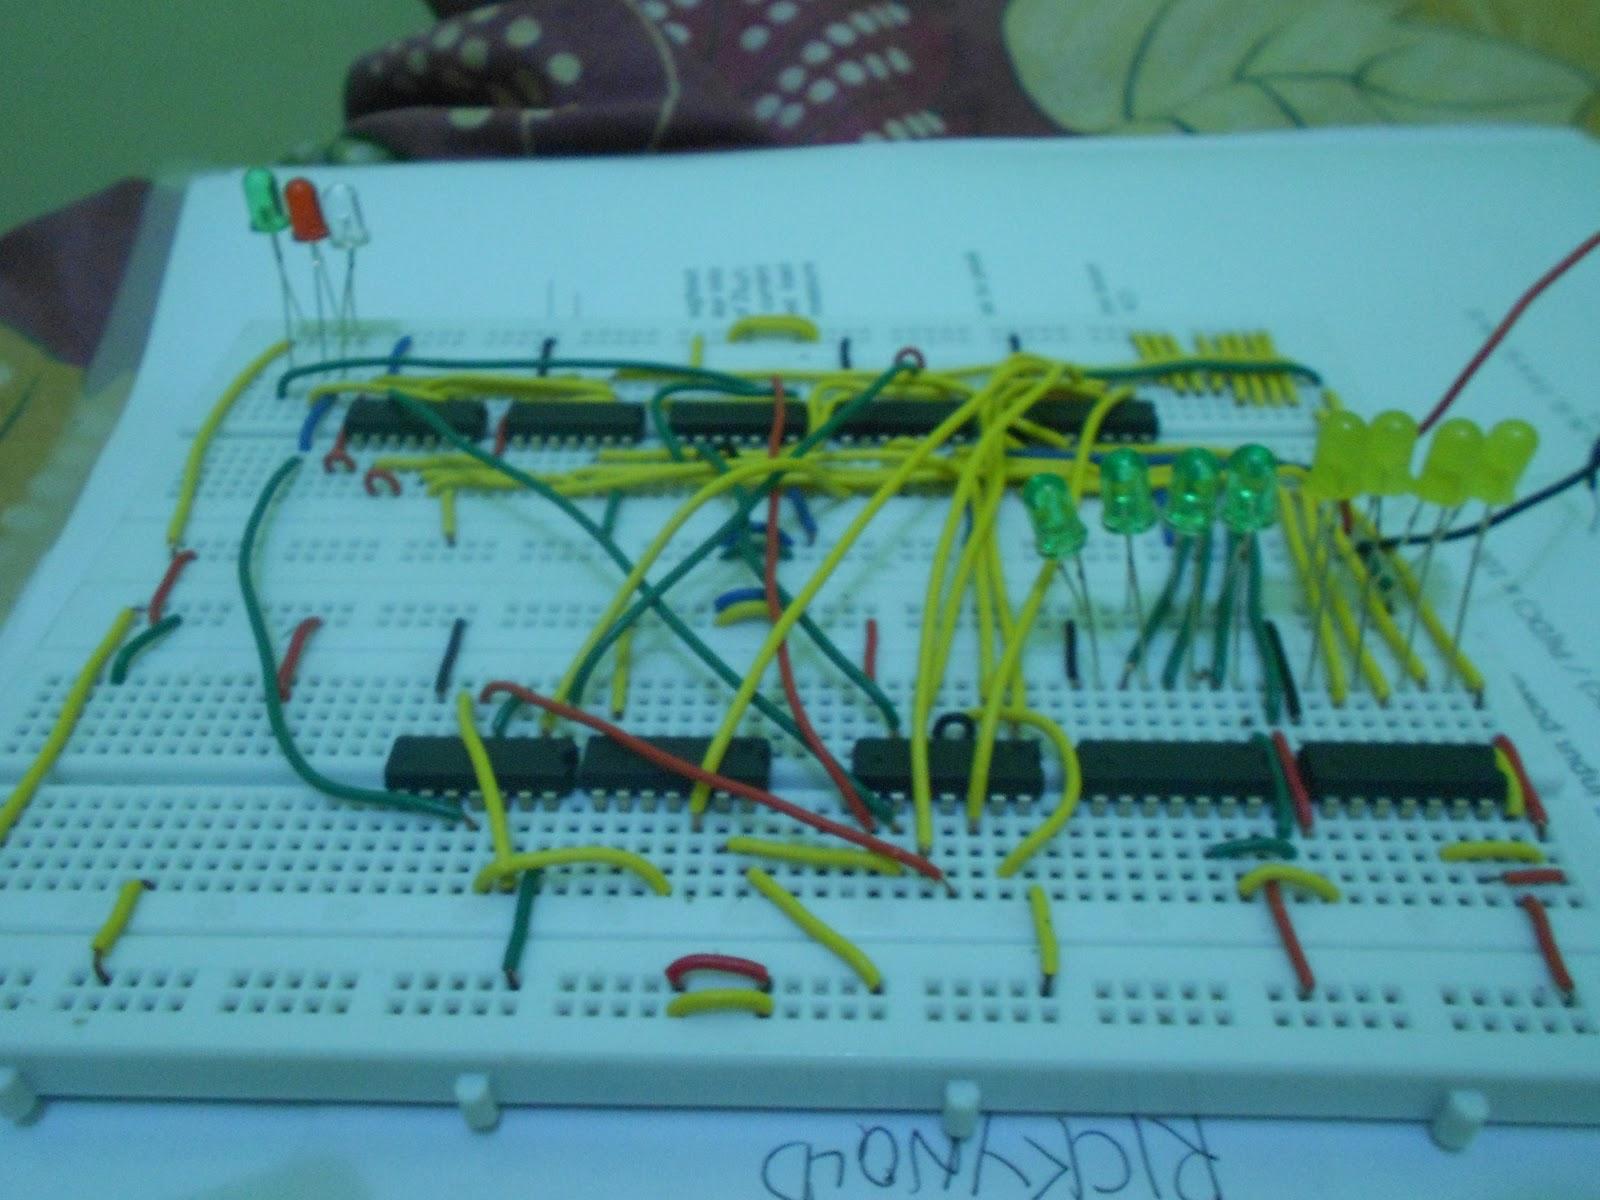 8 bit magnitude comparator logic diagram 98 dodge durango stereo wiring ece circuit